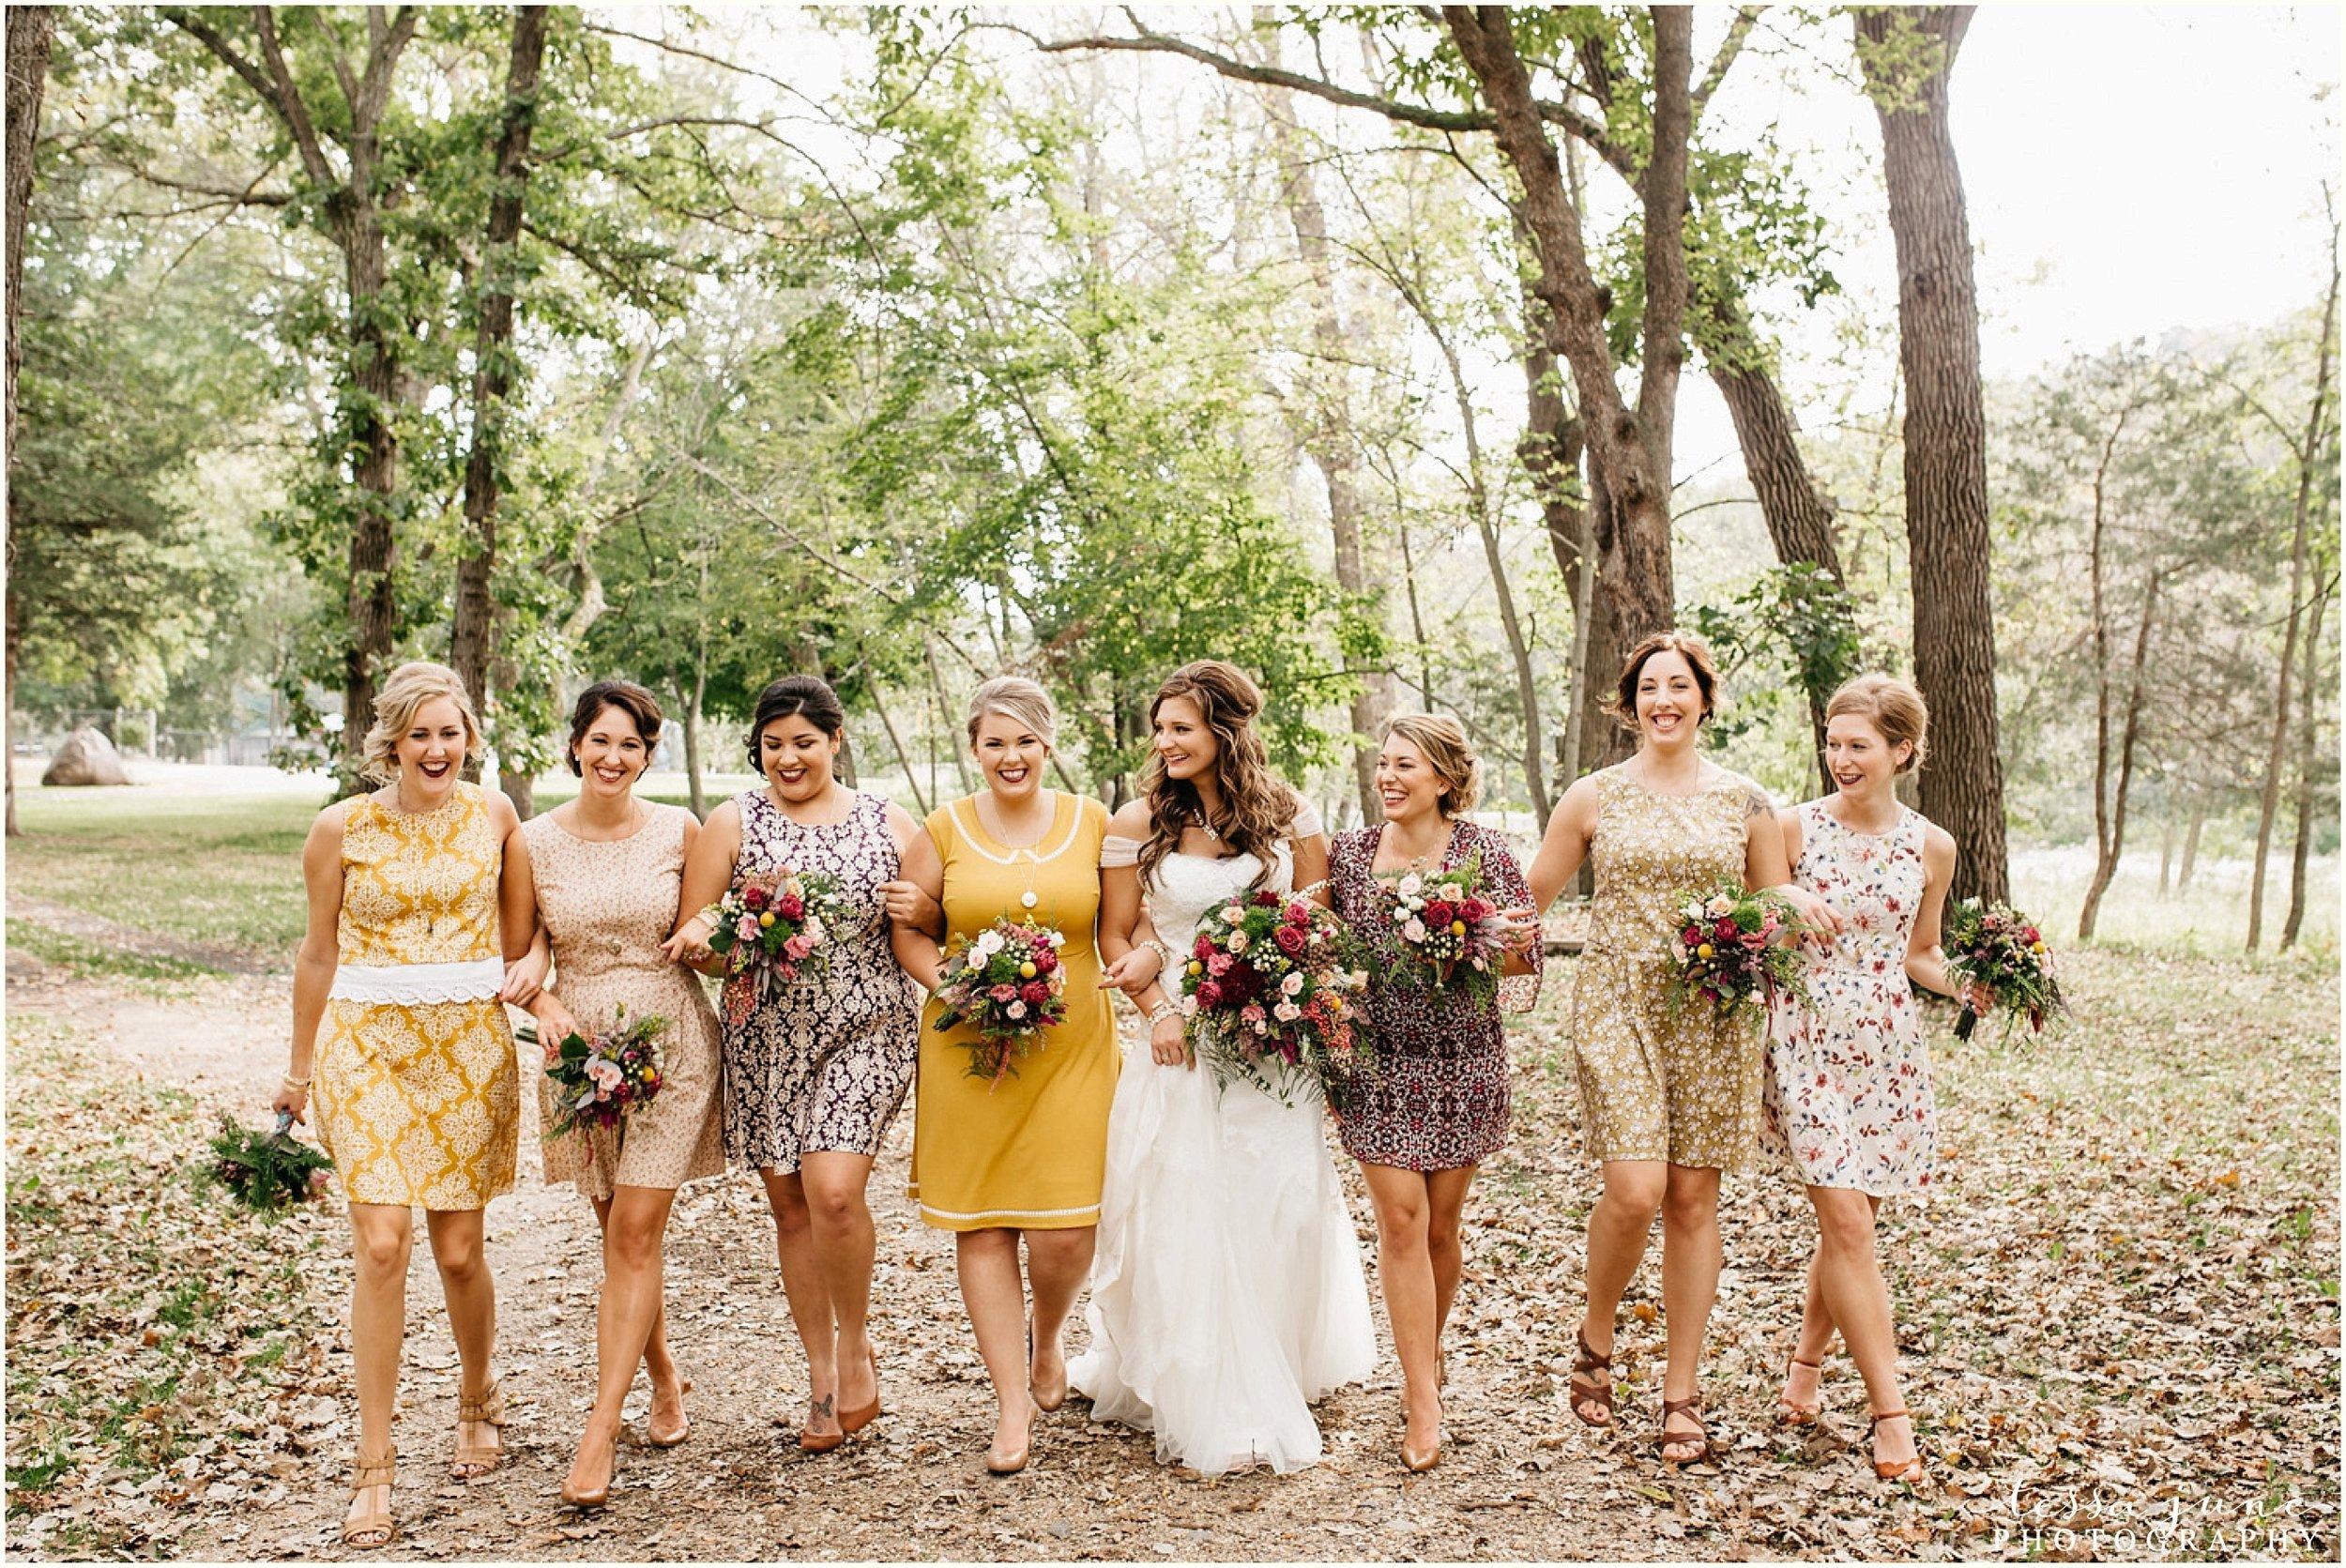 bohemian-minnesota-wedding-mismatched-bridesmaid-dresses-waterfall-st-cloud-tessa-june-photography-76.jpg